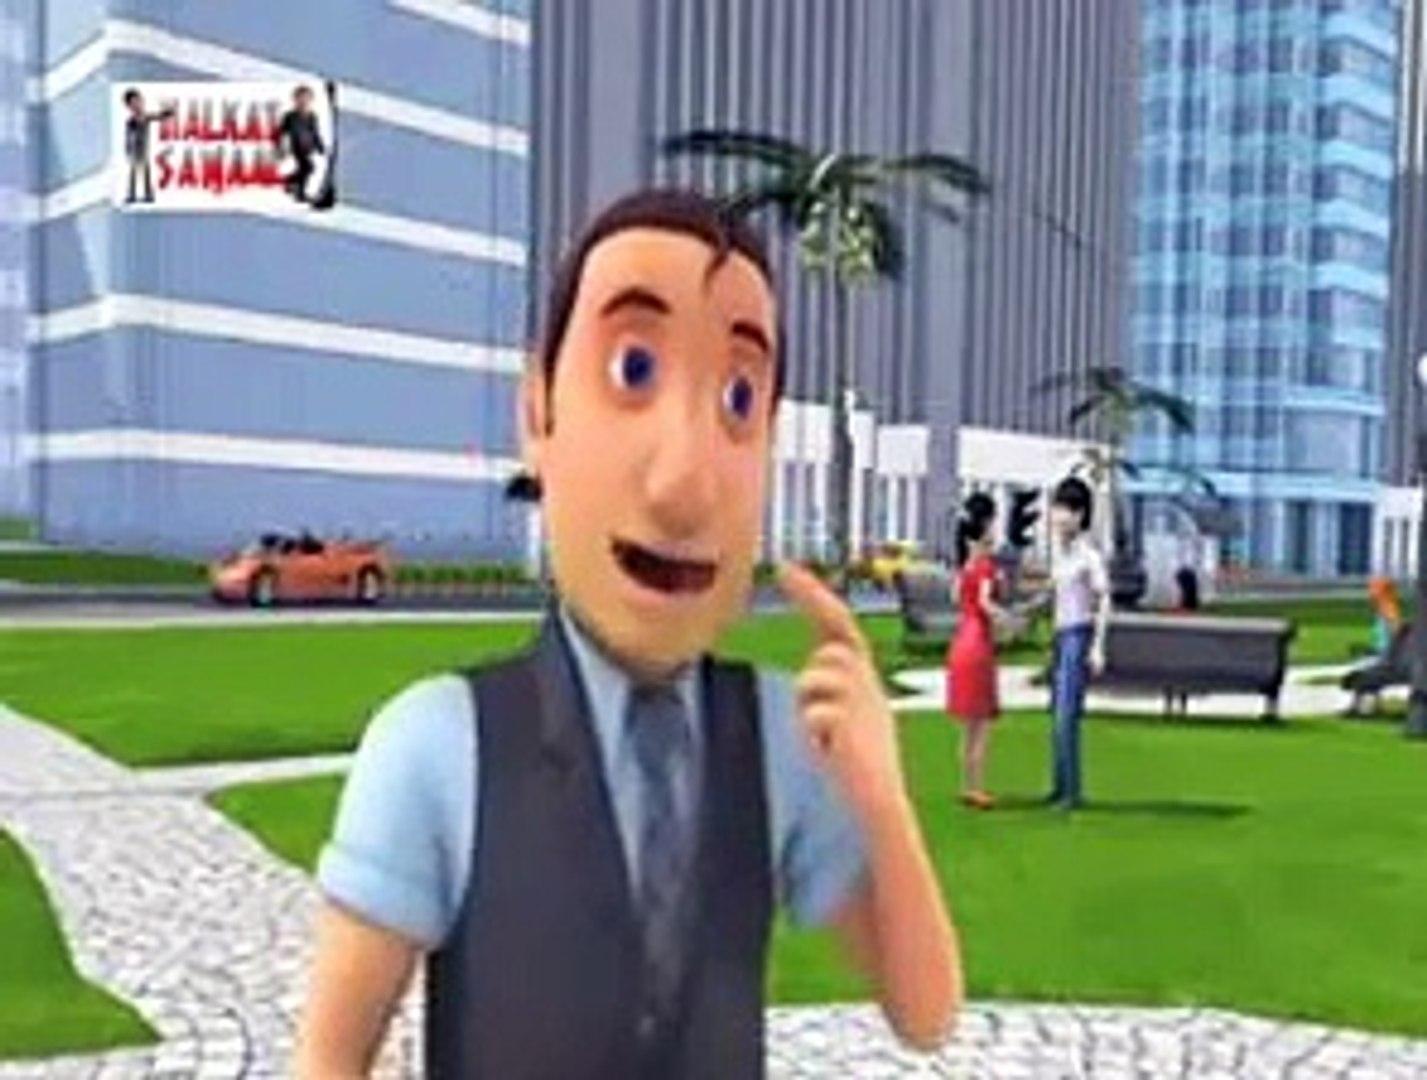 Very very very Funny video clip Halkat Sawal Funny Cartoon